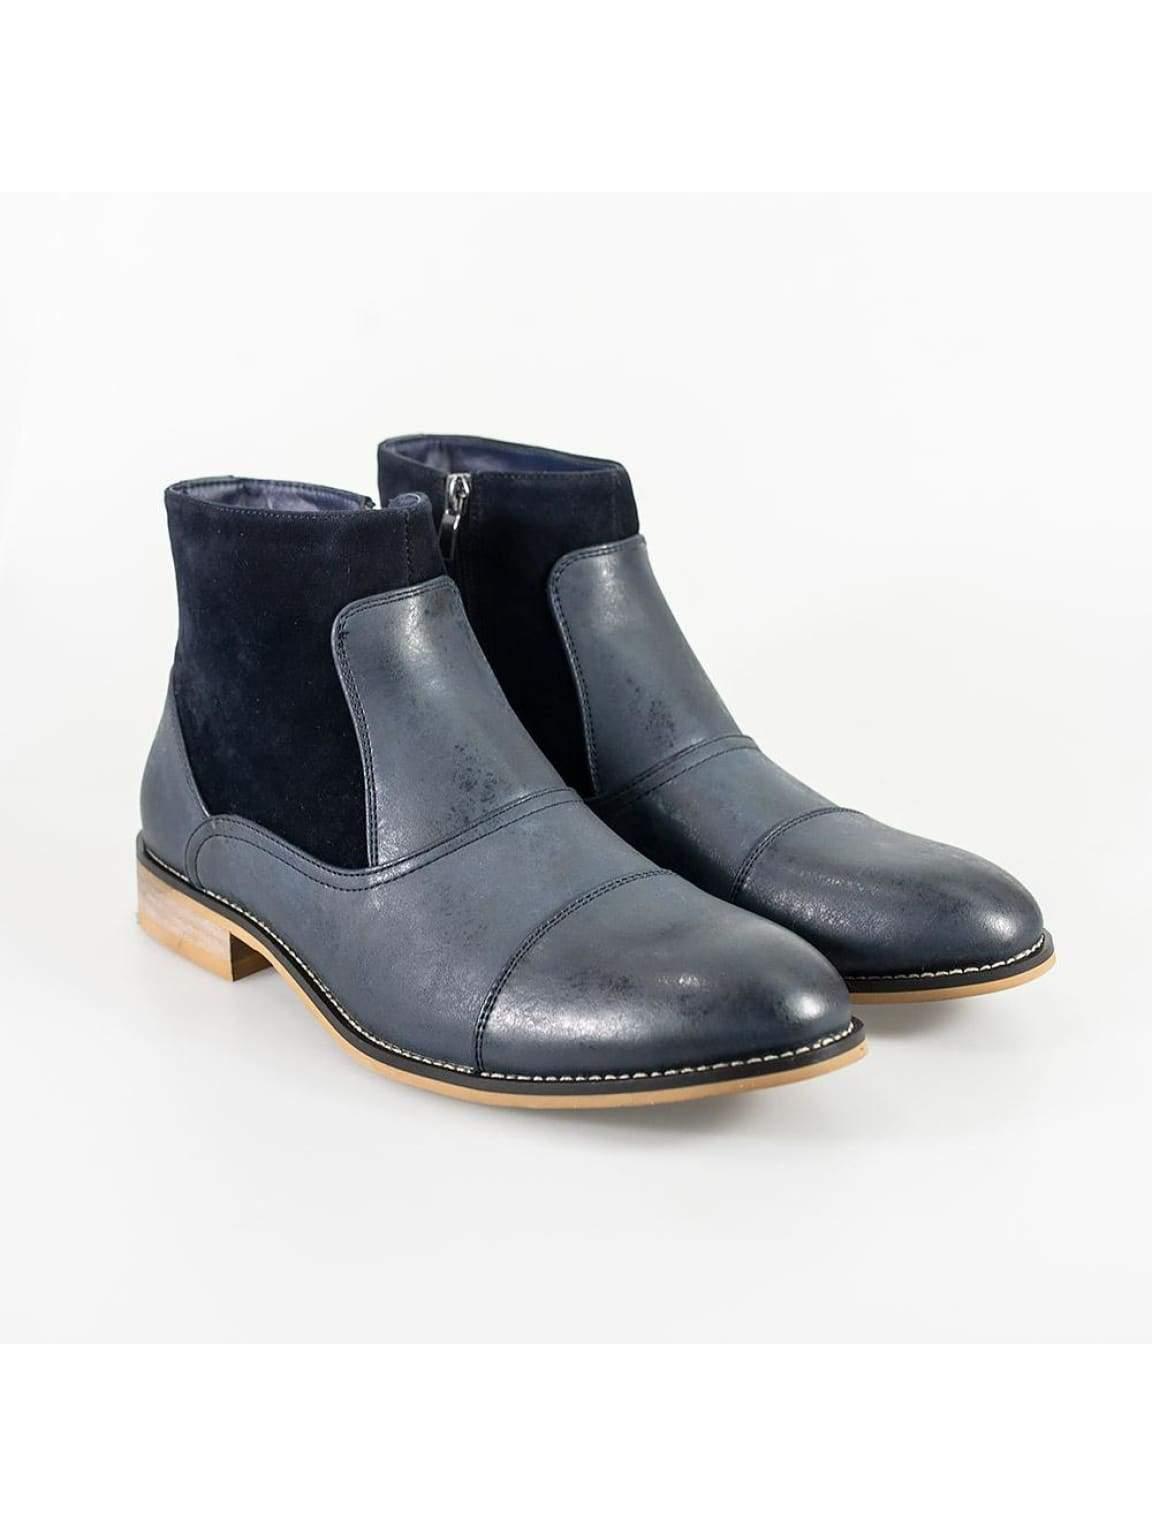 Cavani Halifax Navy Mens Leather Boots - UK6 | EU41 - Boots